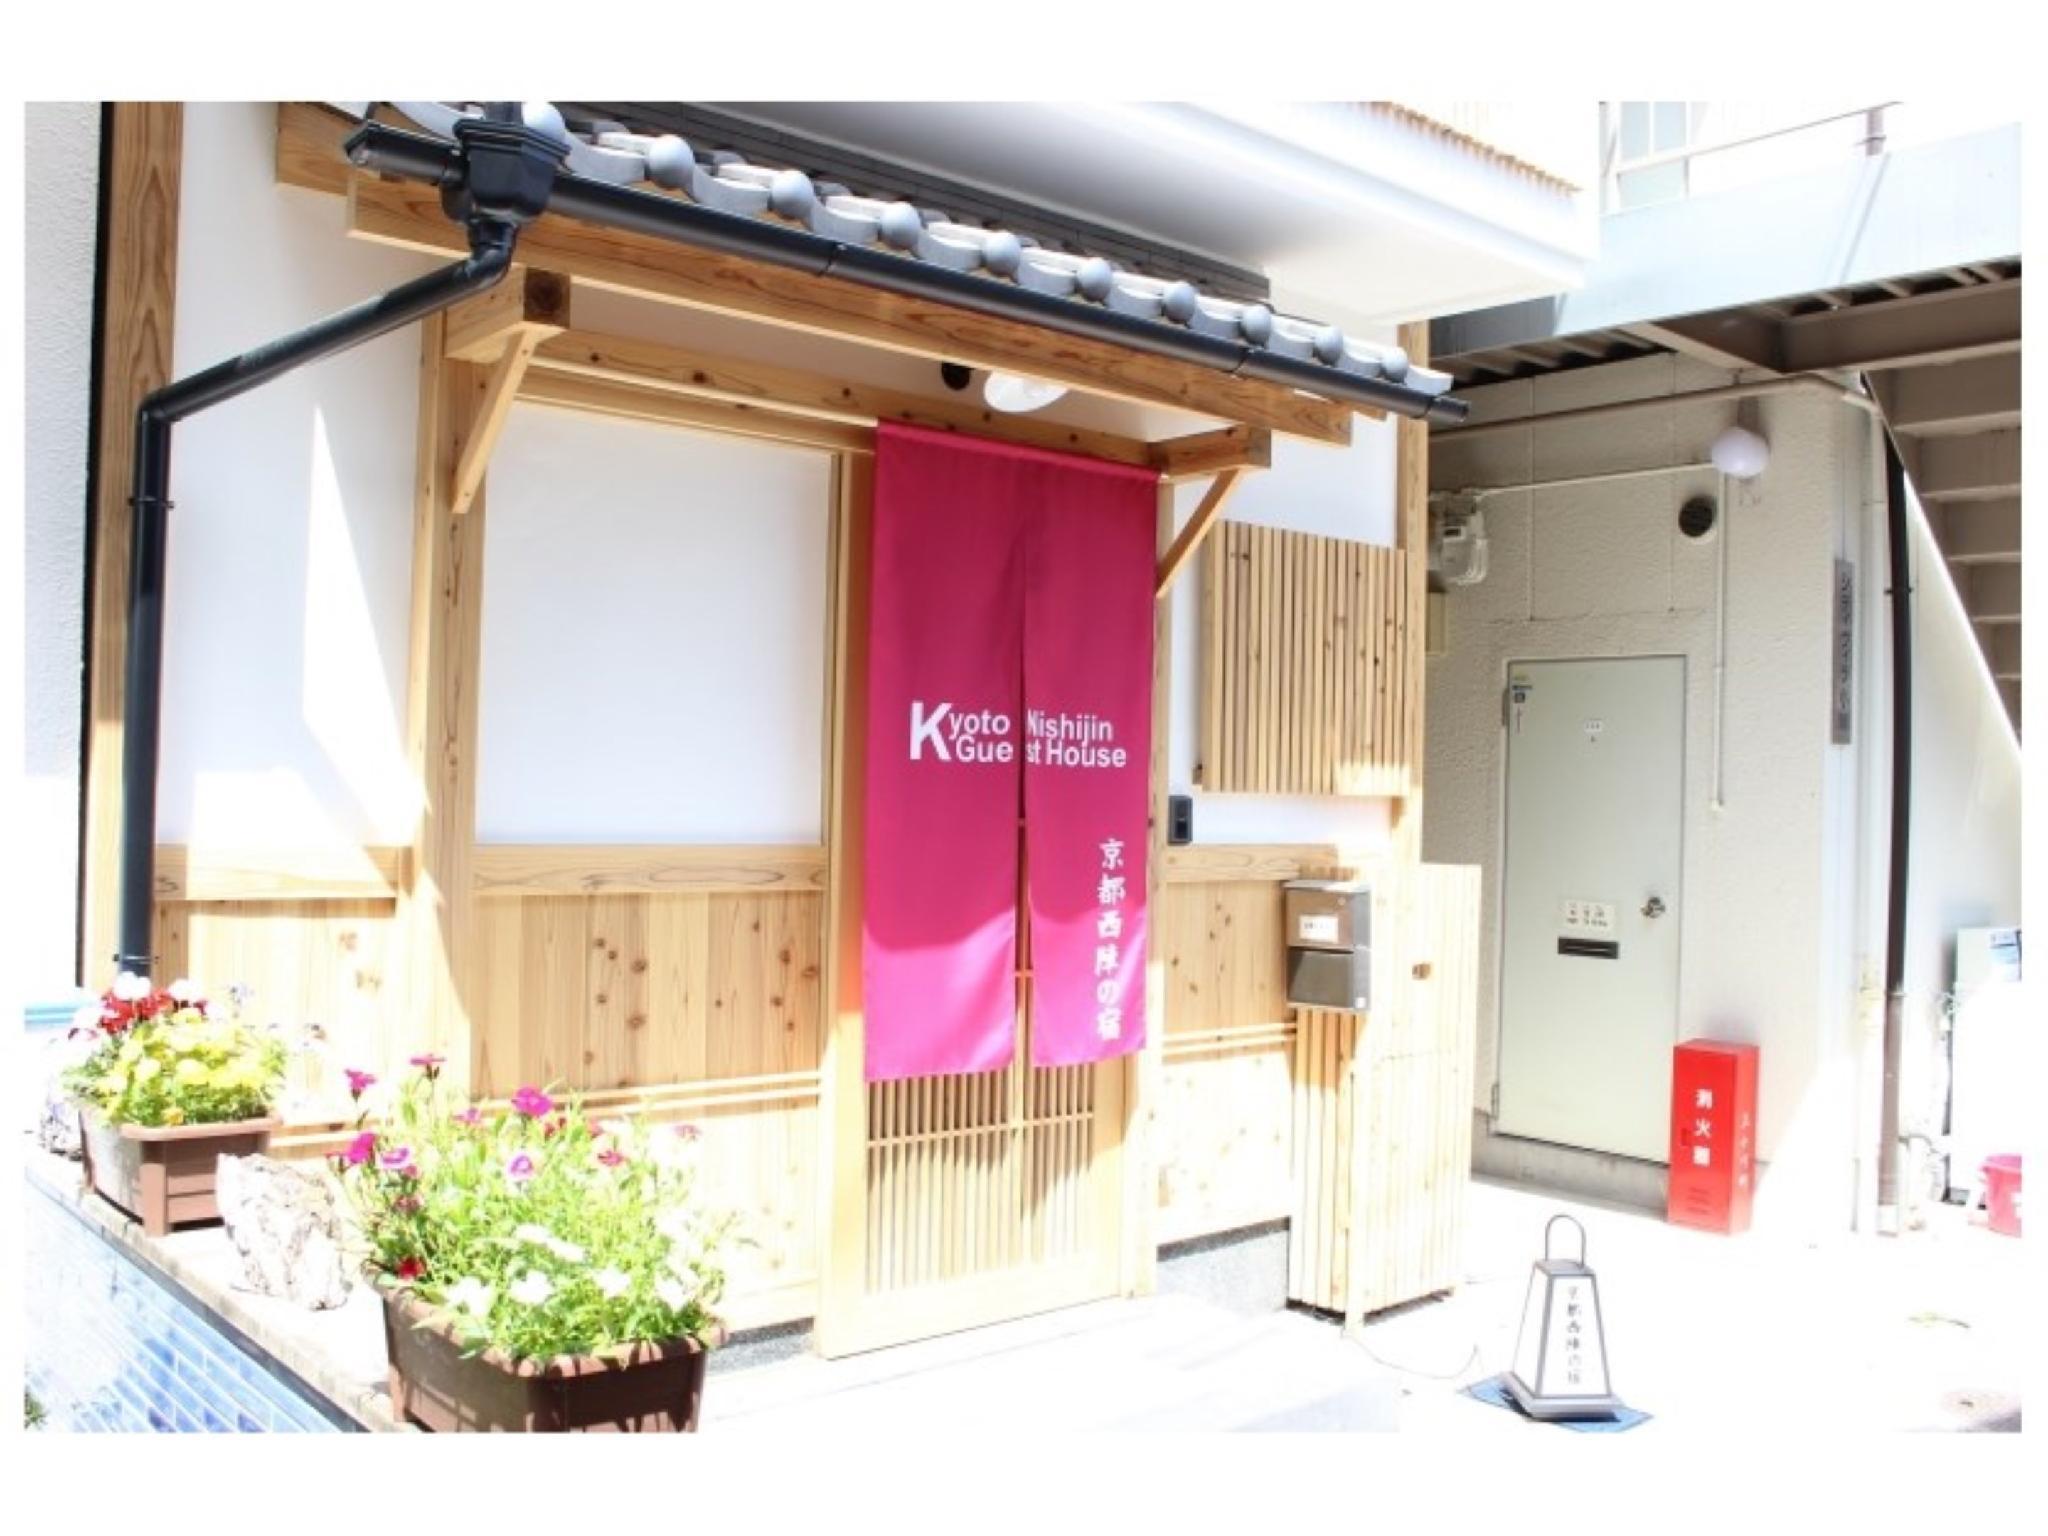 Kyoto Nishijin Guest House